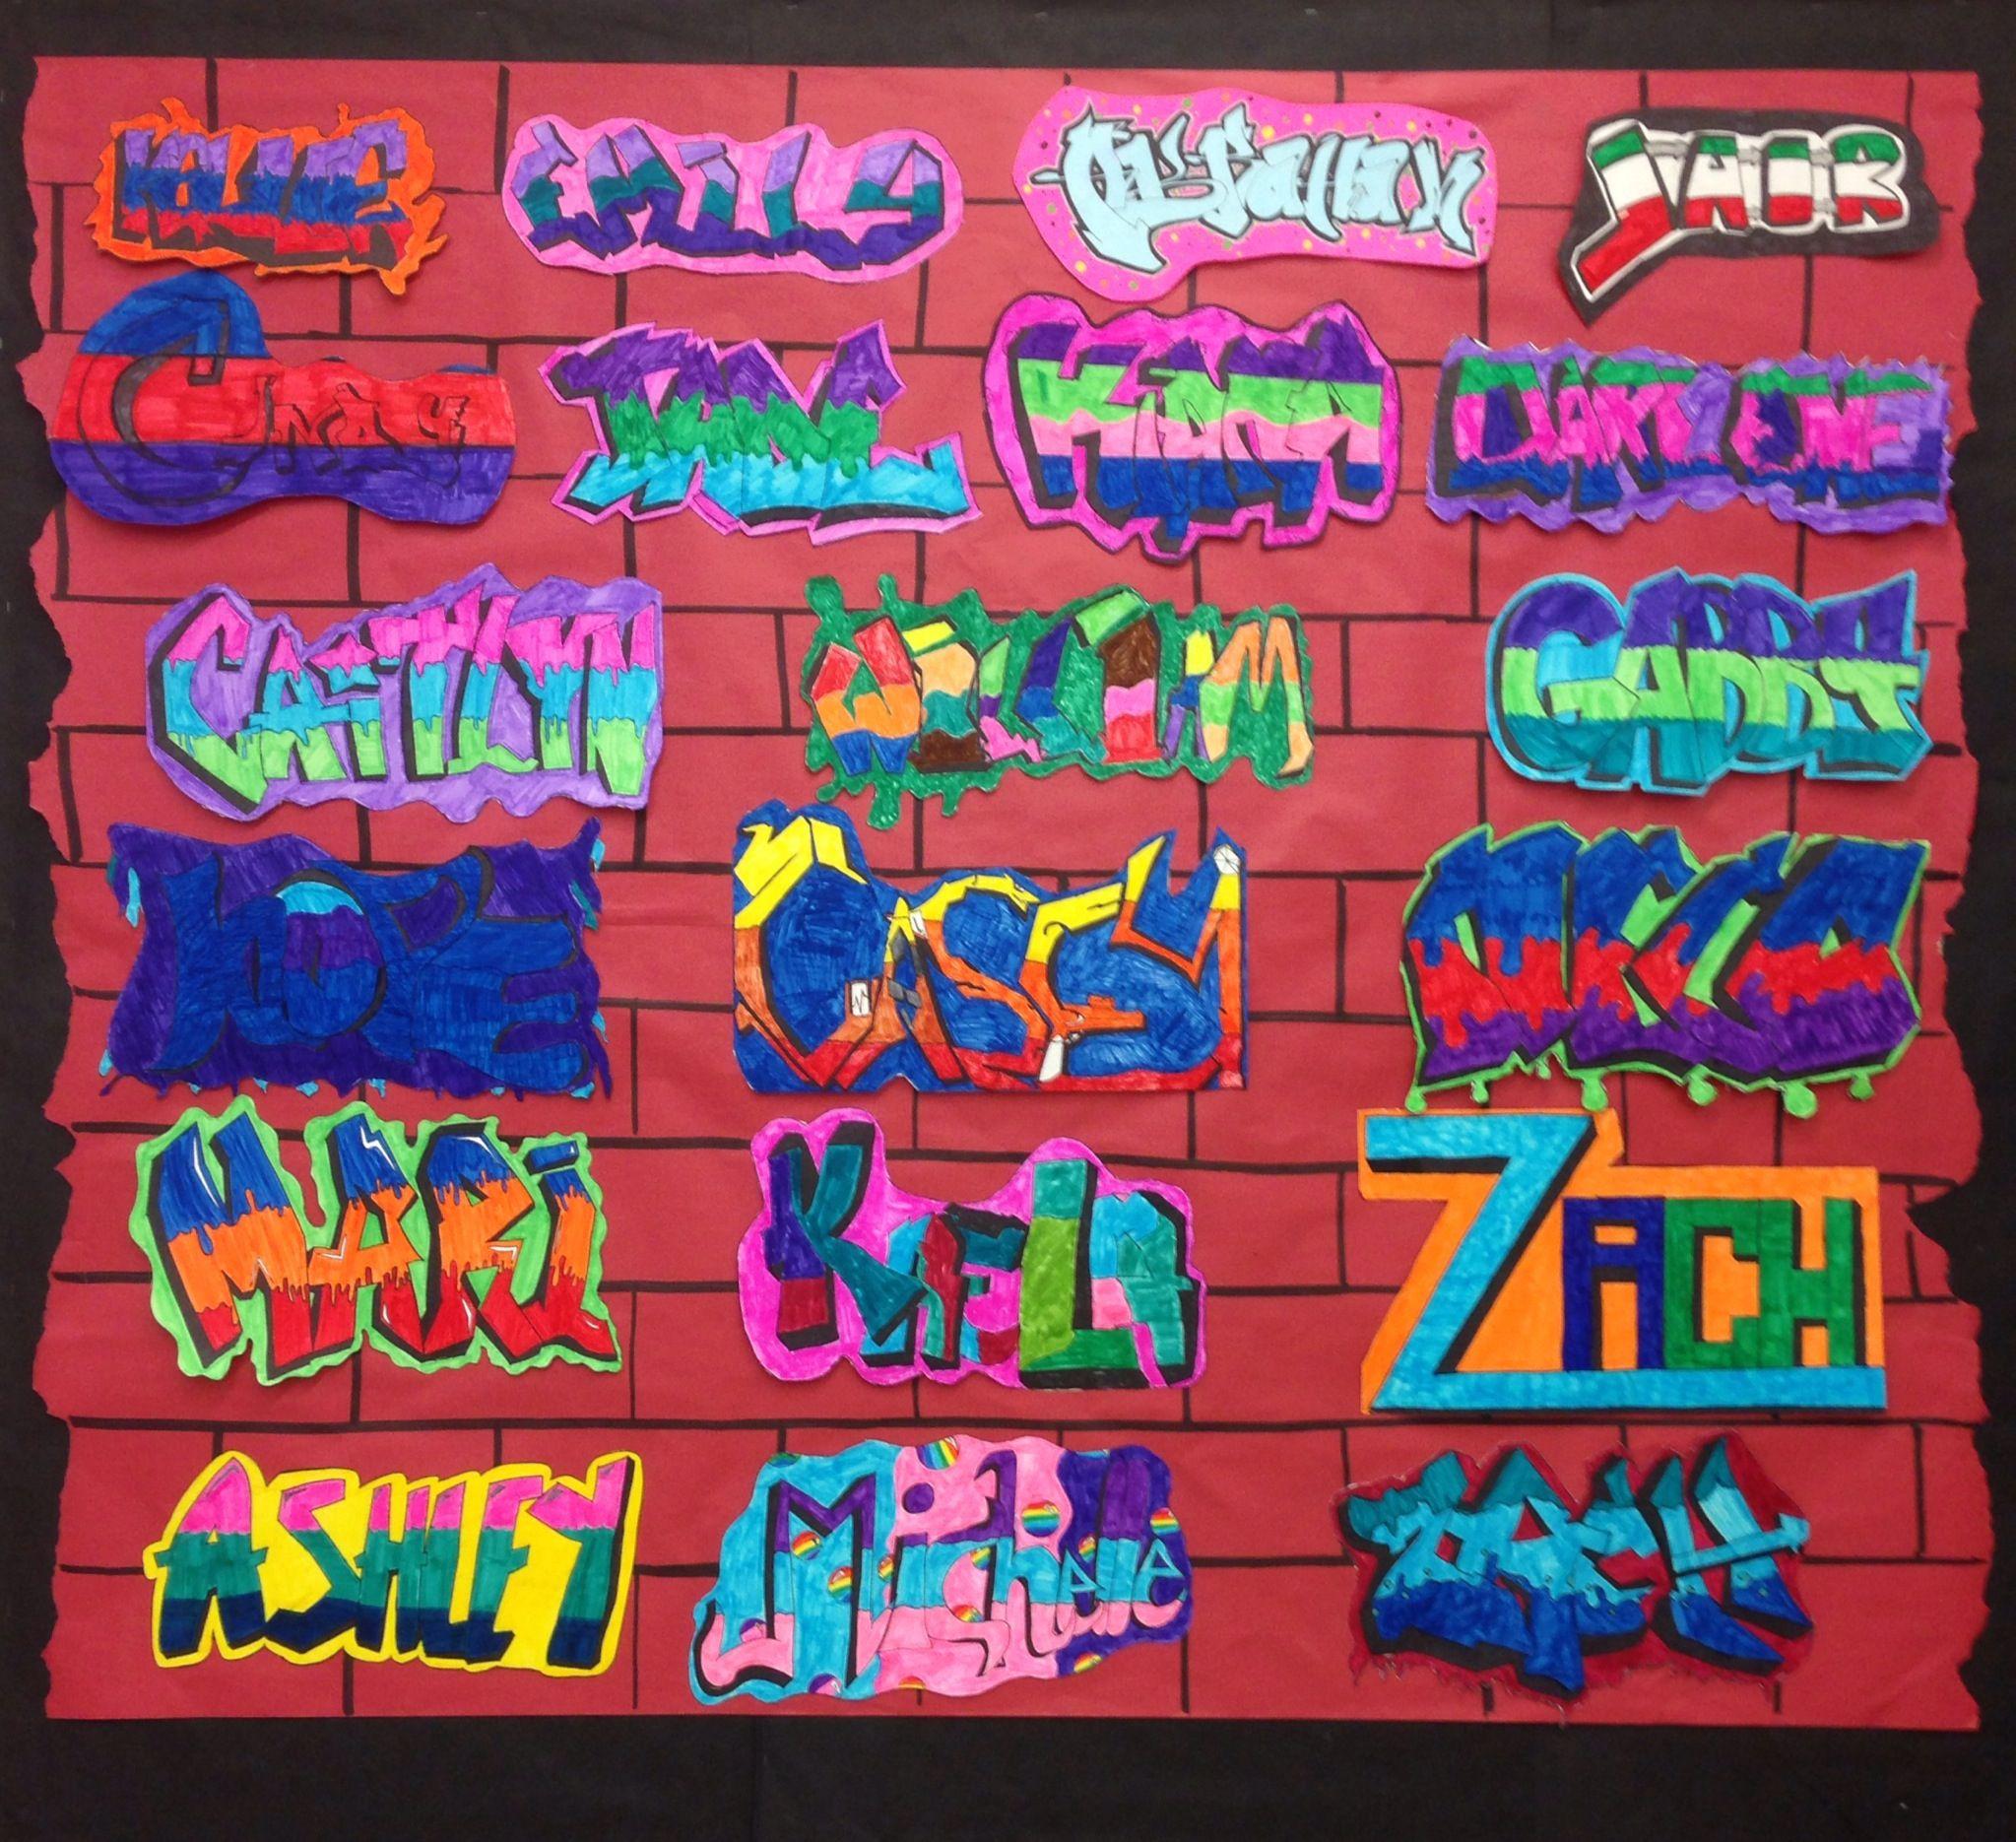 Mrs mclains art room graffiti name tags middle school art